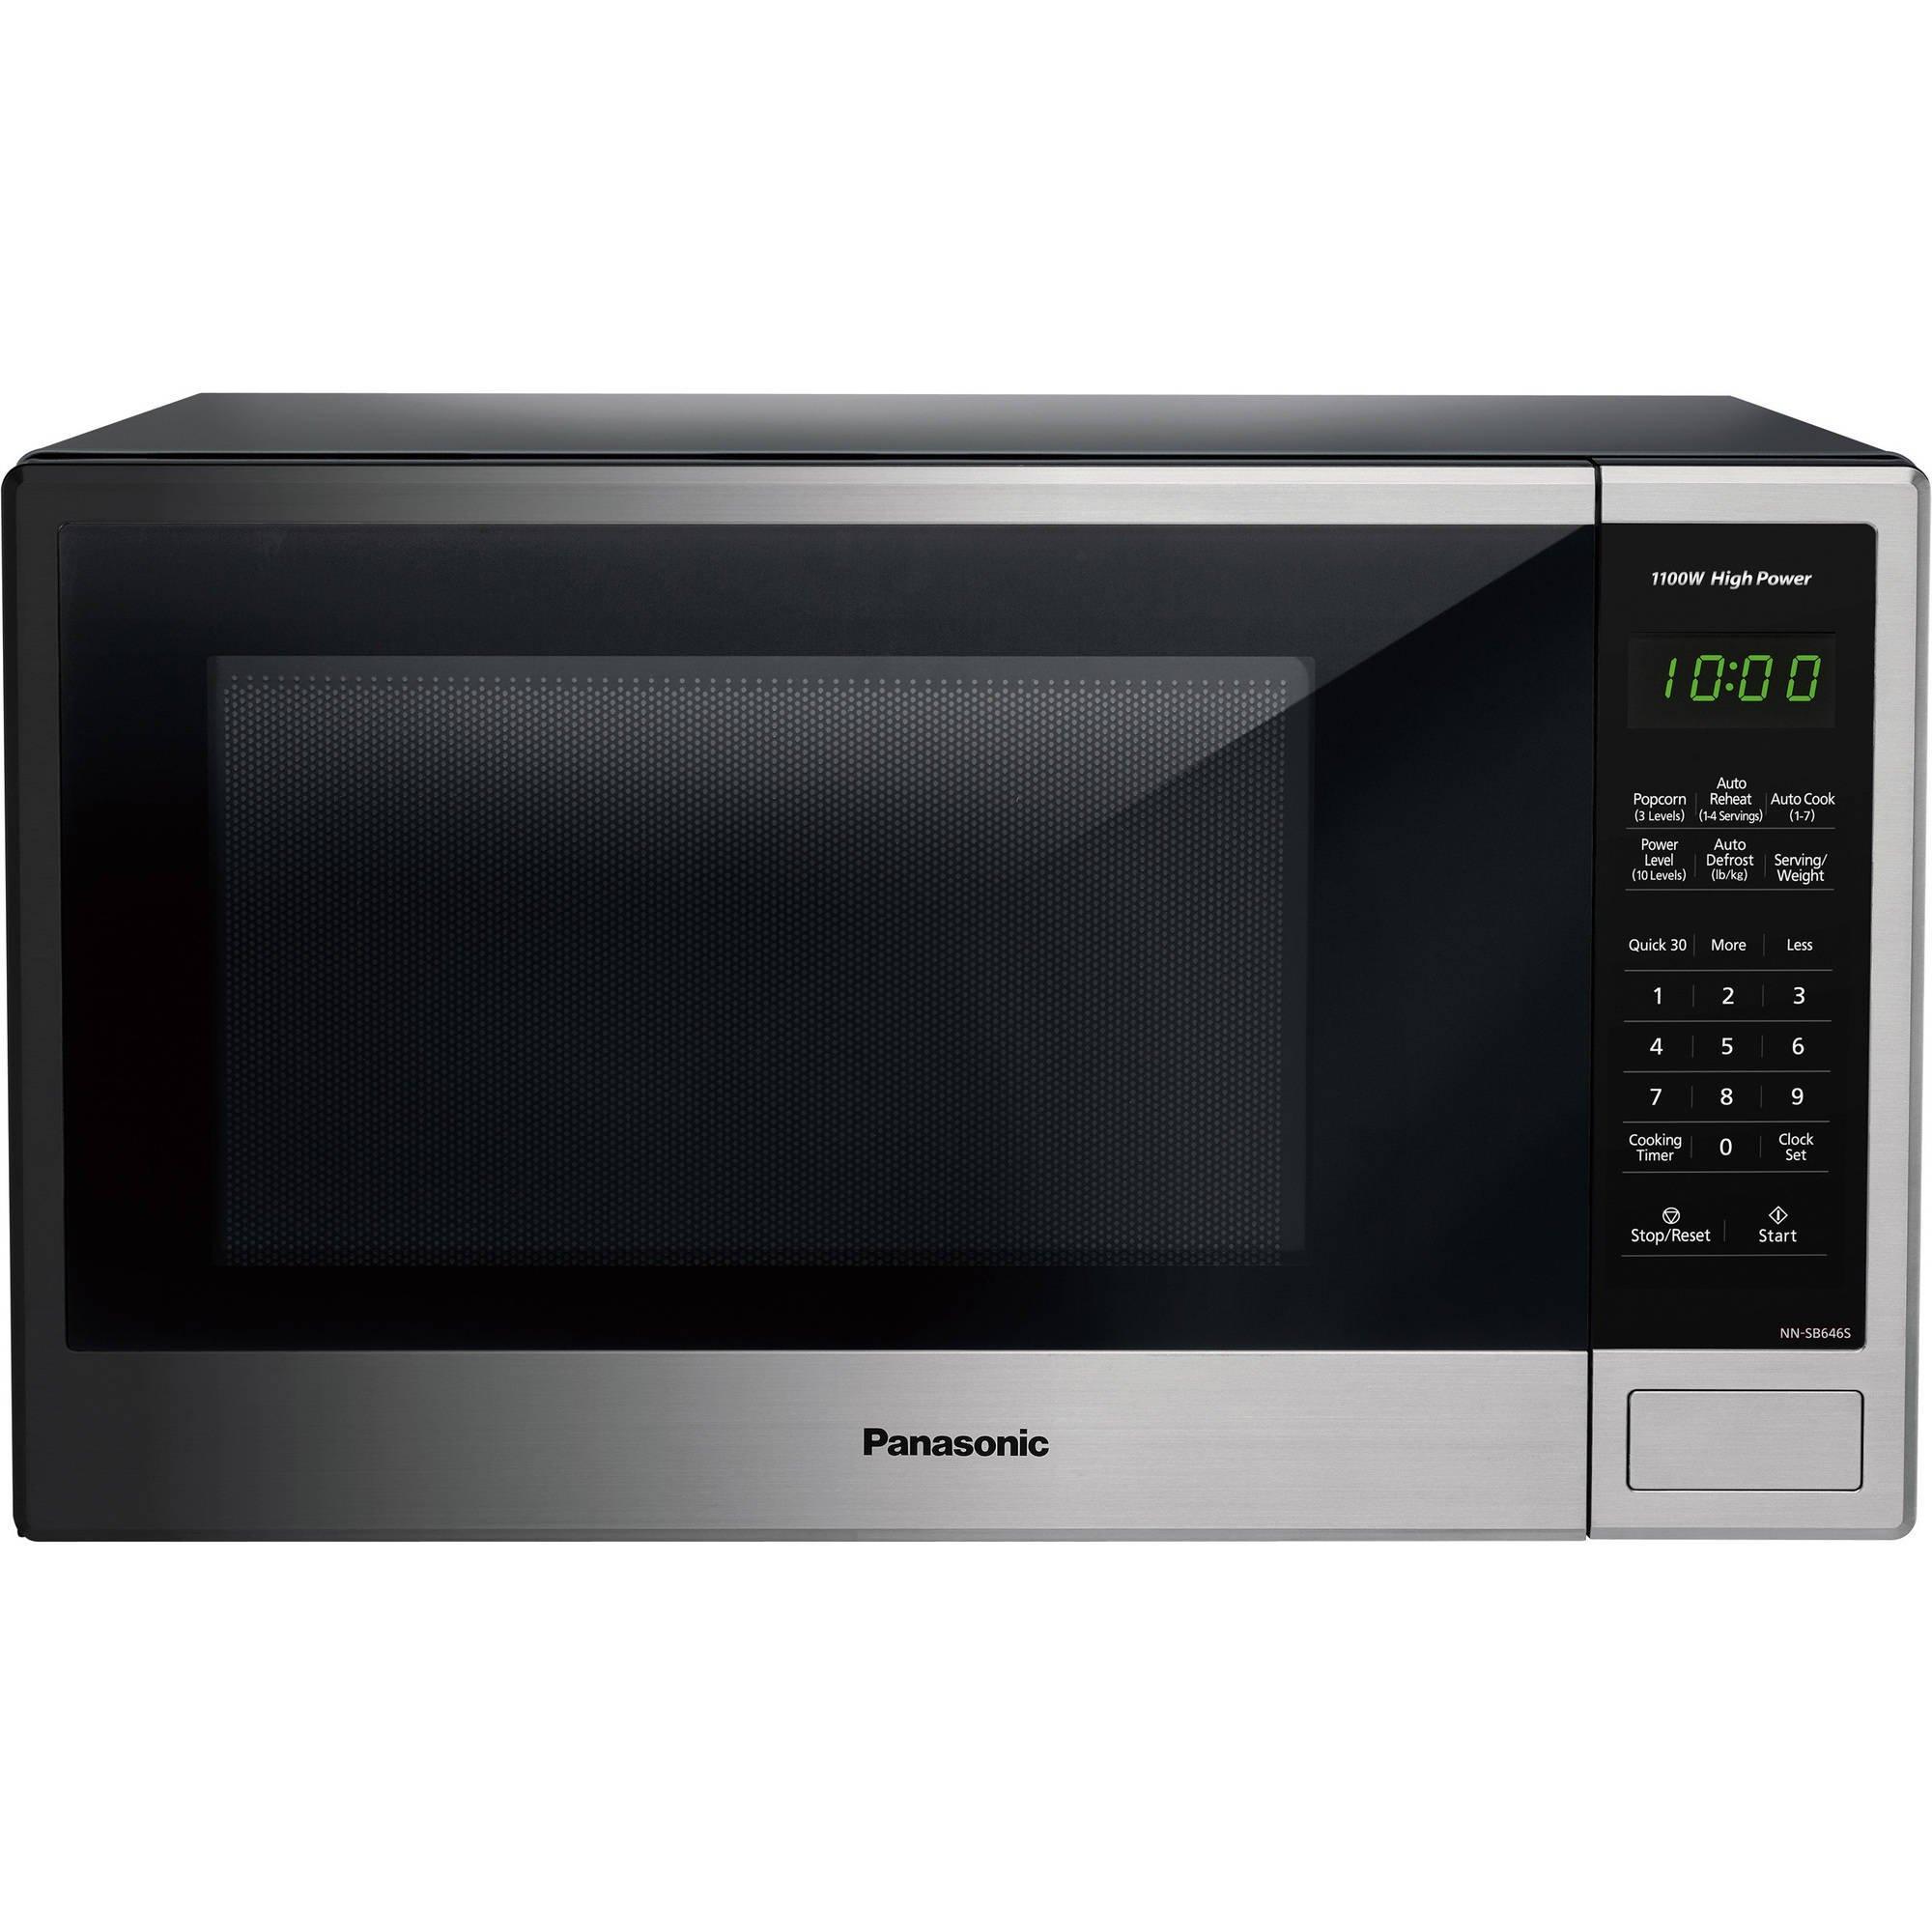 Panasonic Microwave Oven, Stainless(1.3 Cu Ft NN-SB646S)